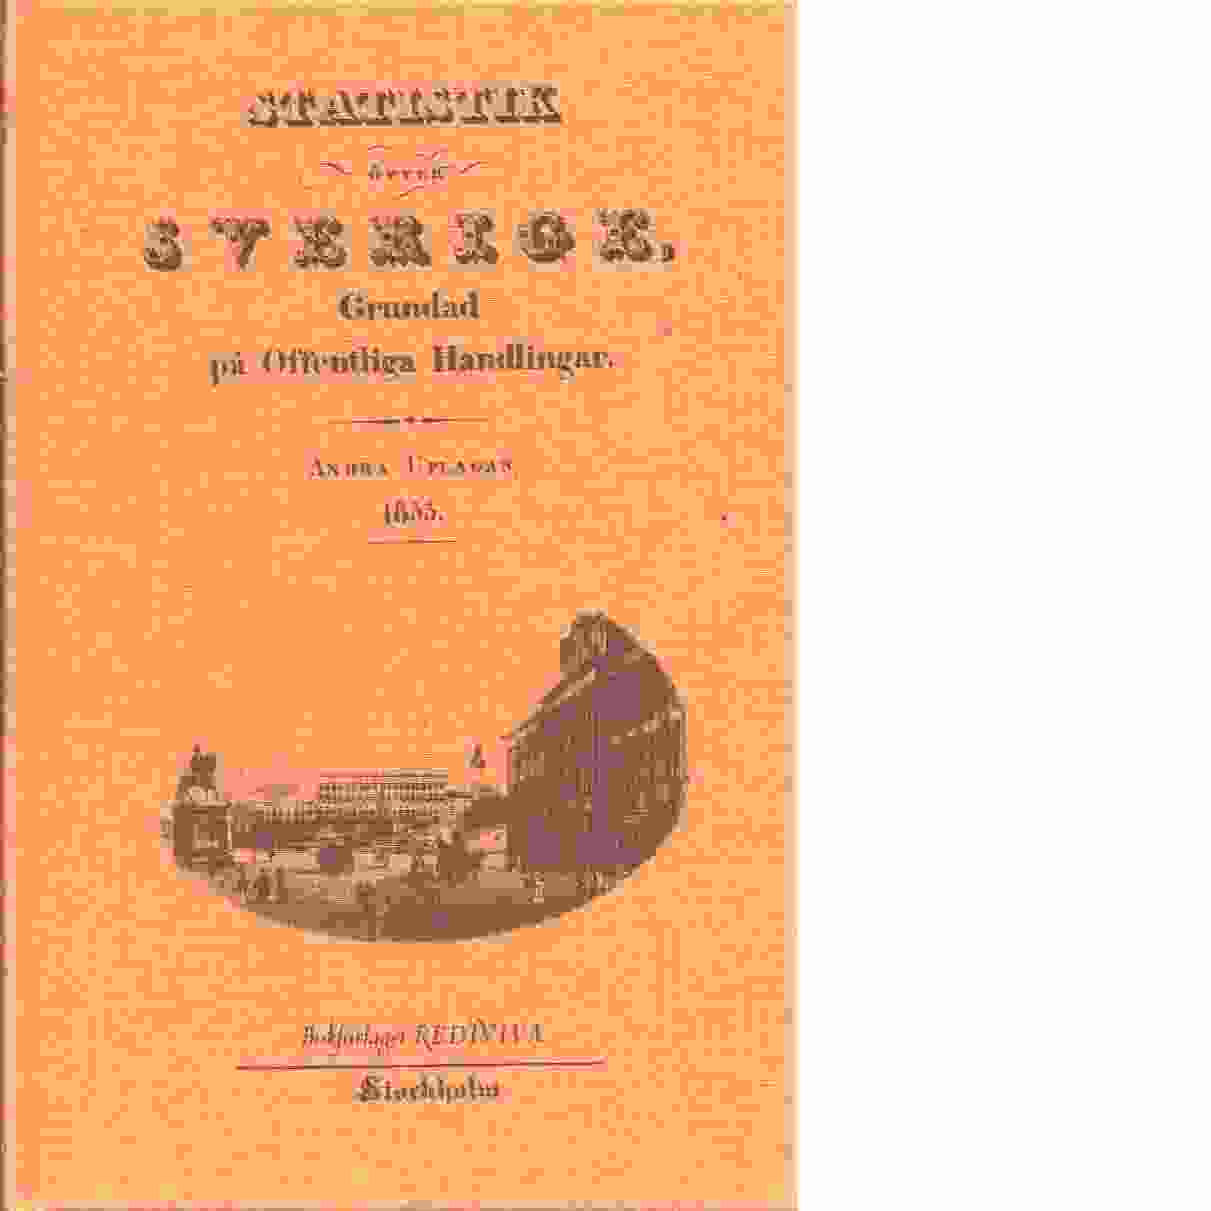 Statistik öfver Sverige, grundad på offentliga handlingar - Forsell, Carl af